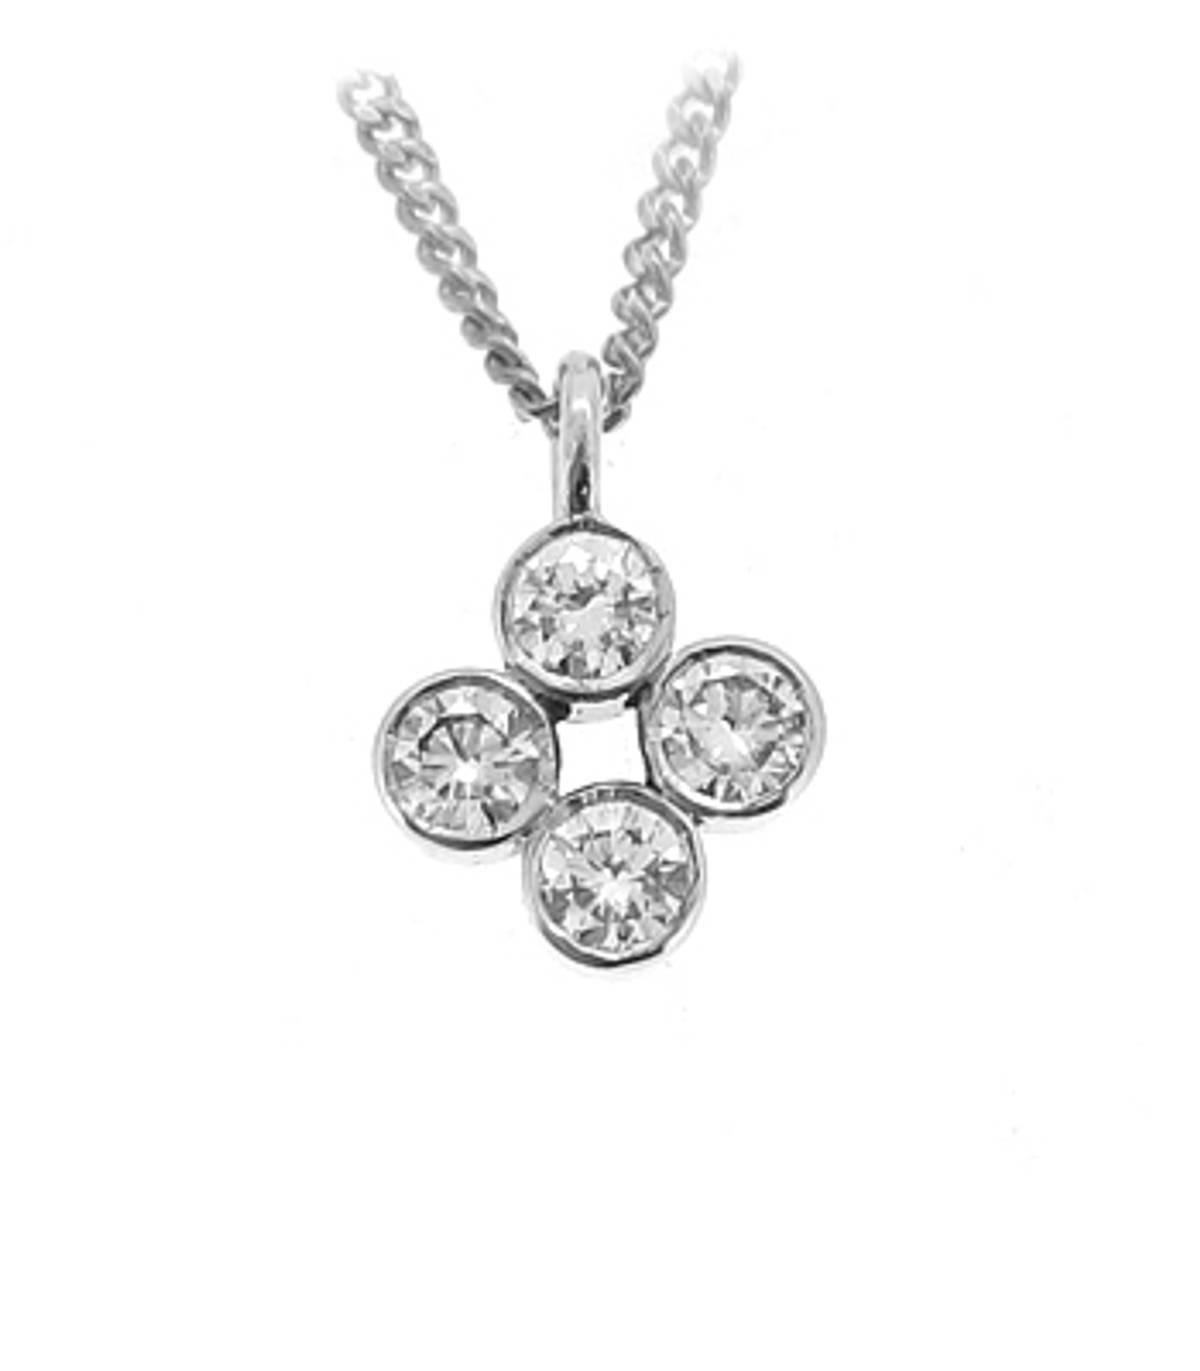 "18ct white gold 4 stone brilliant cut diamond pendant with ""rub over"" setting.  Diamond Cut: Brilliant Setting: Rub Over Setting Chain: 18k white gold 18 inch chain Carat: Total diamond weight 0.45 carats Pendant Size: 13mm x 9mm"